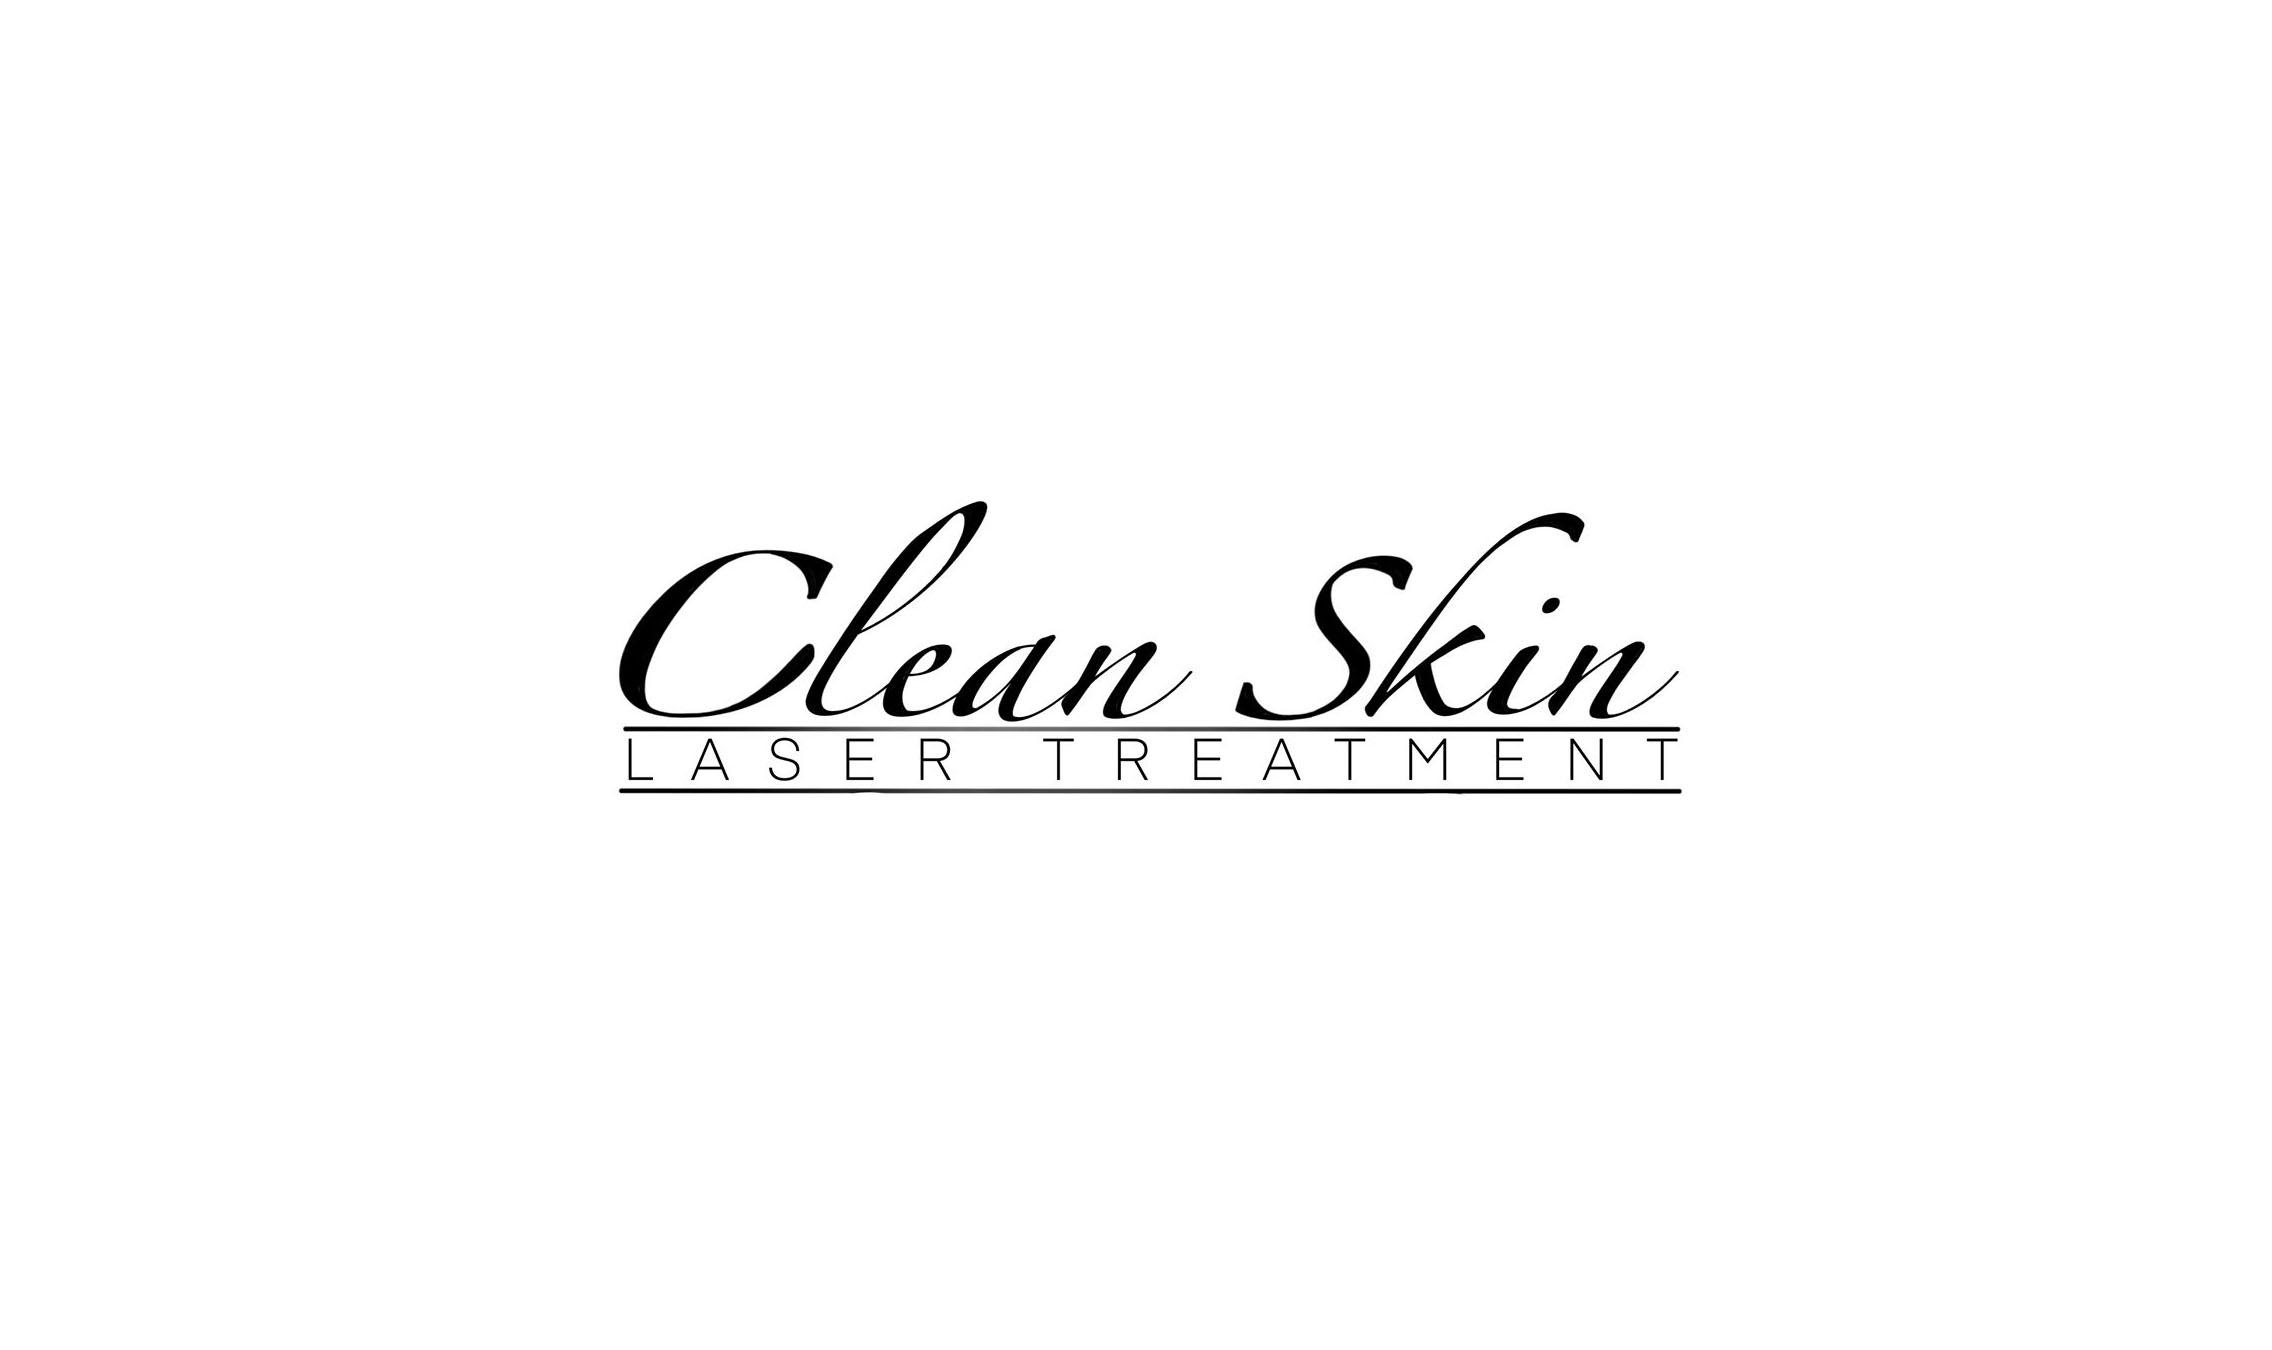 Clean skin laser treatment